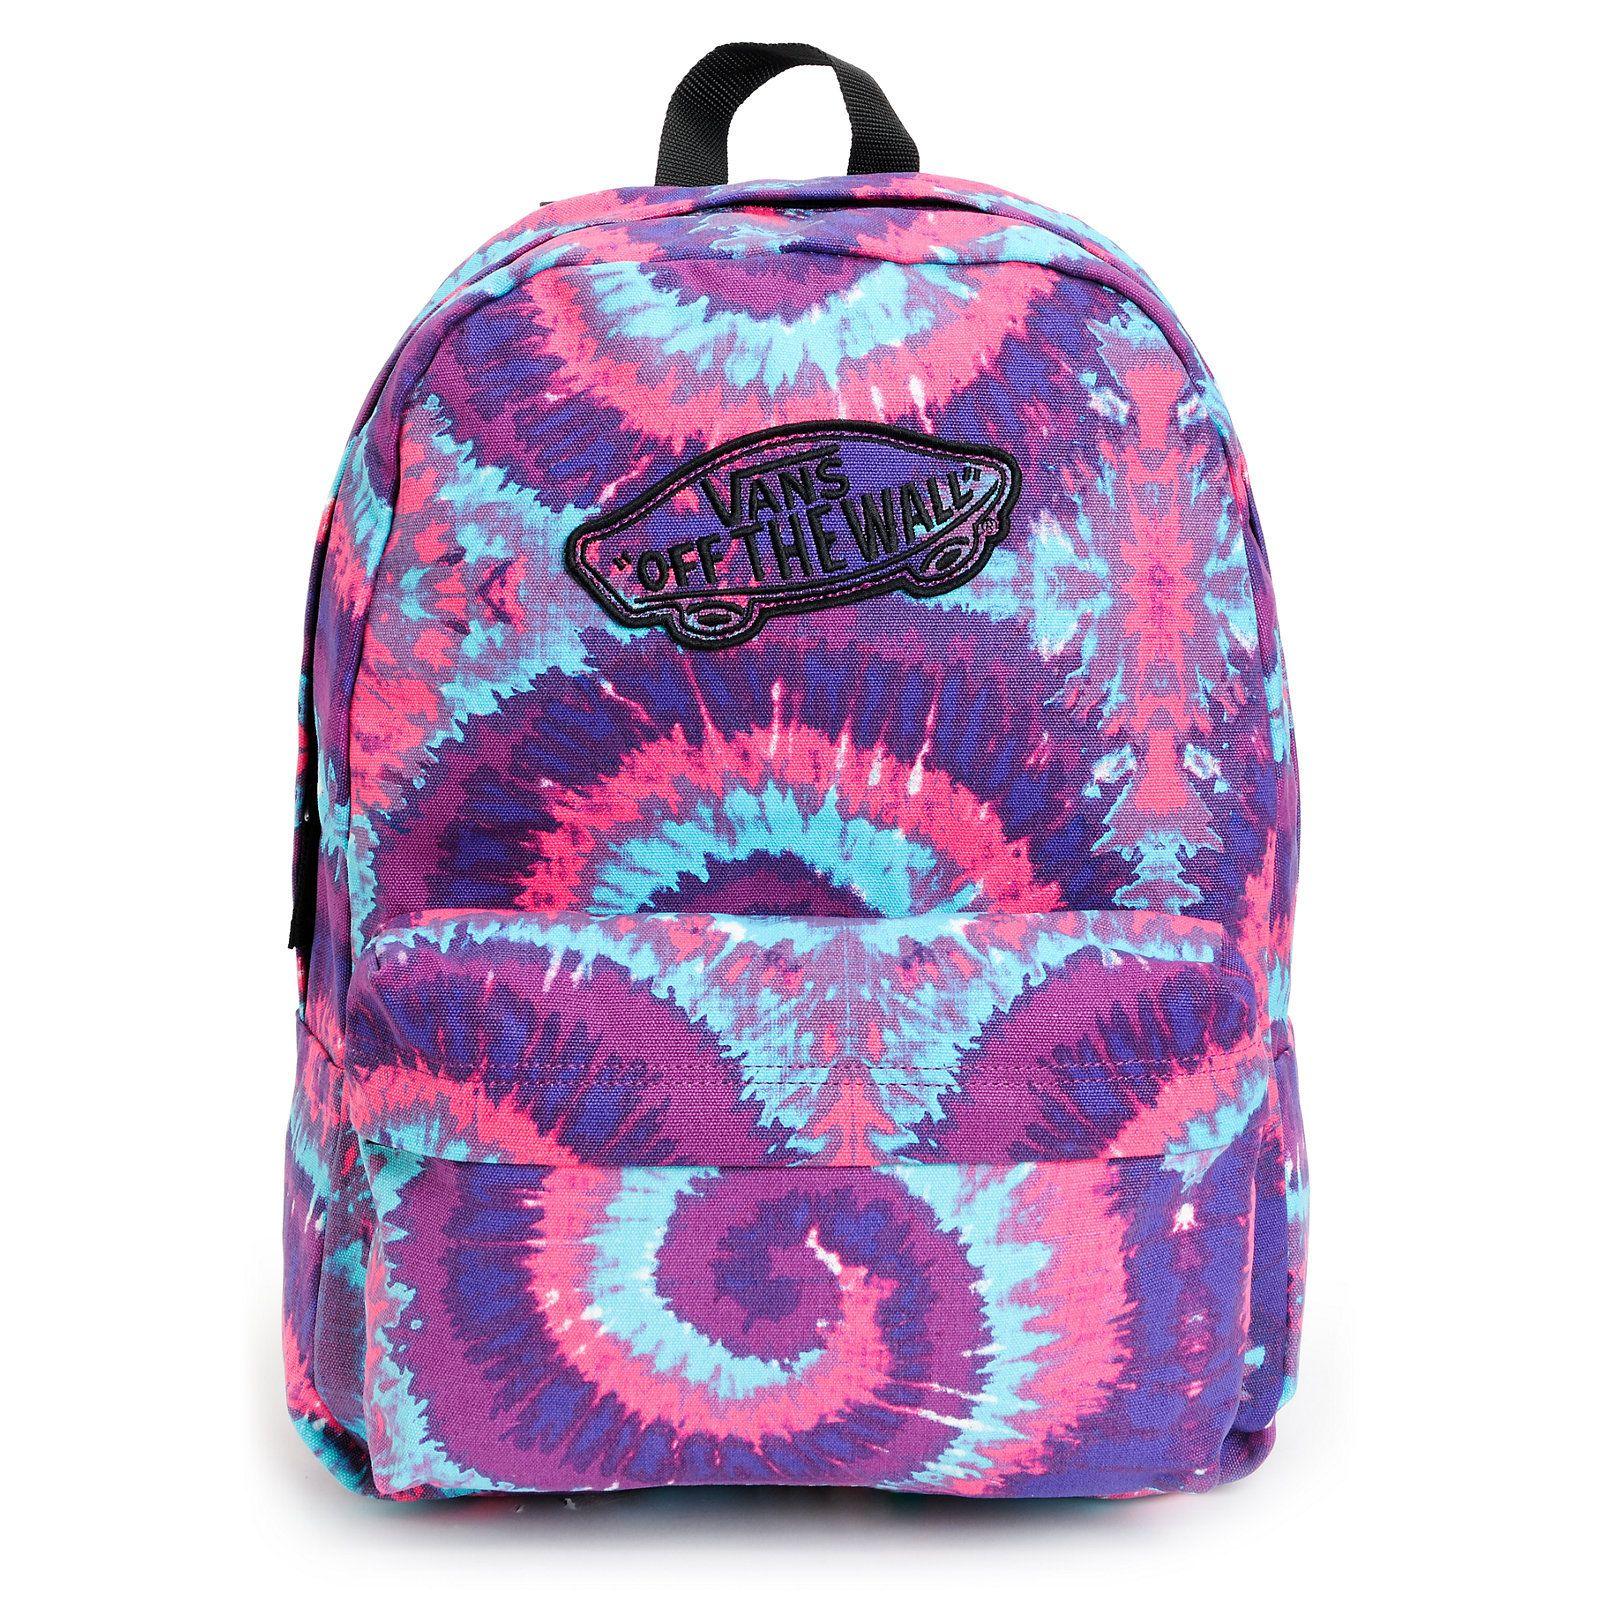 vans realm pink purple tie dye backpack b a c k p a c k s